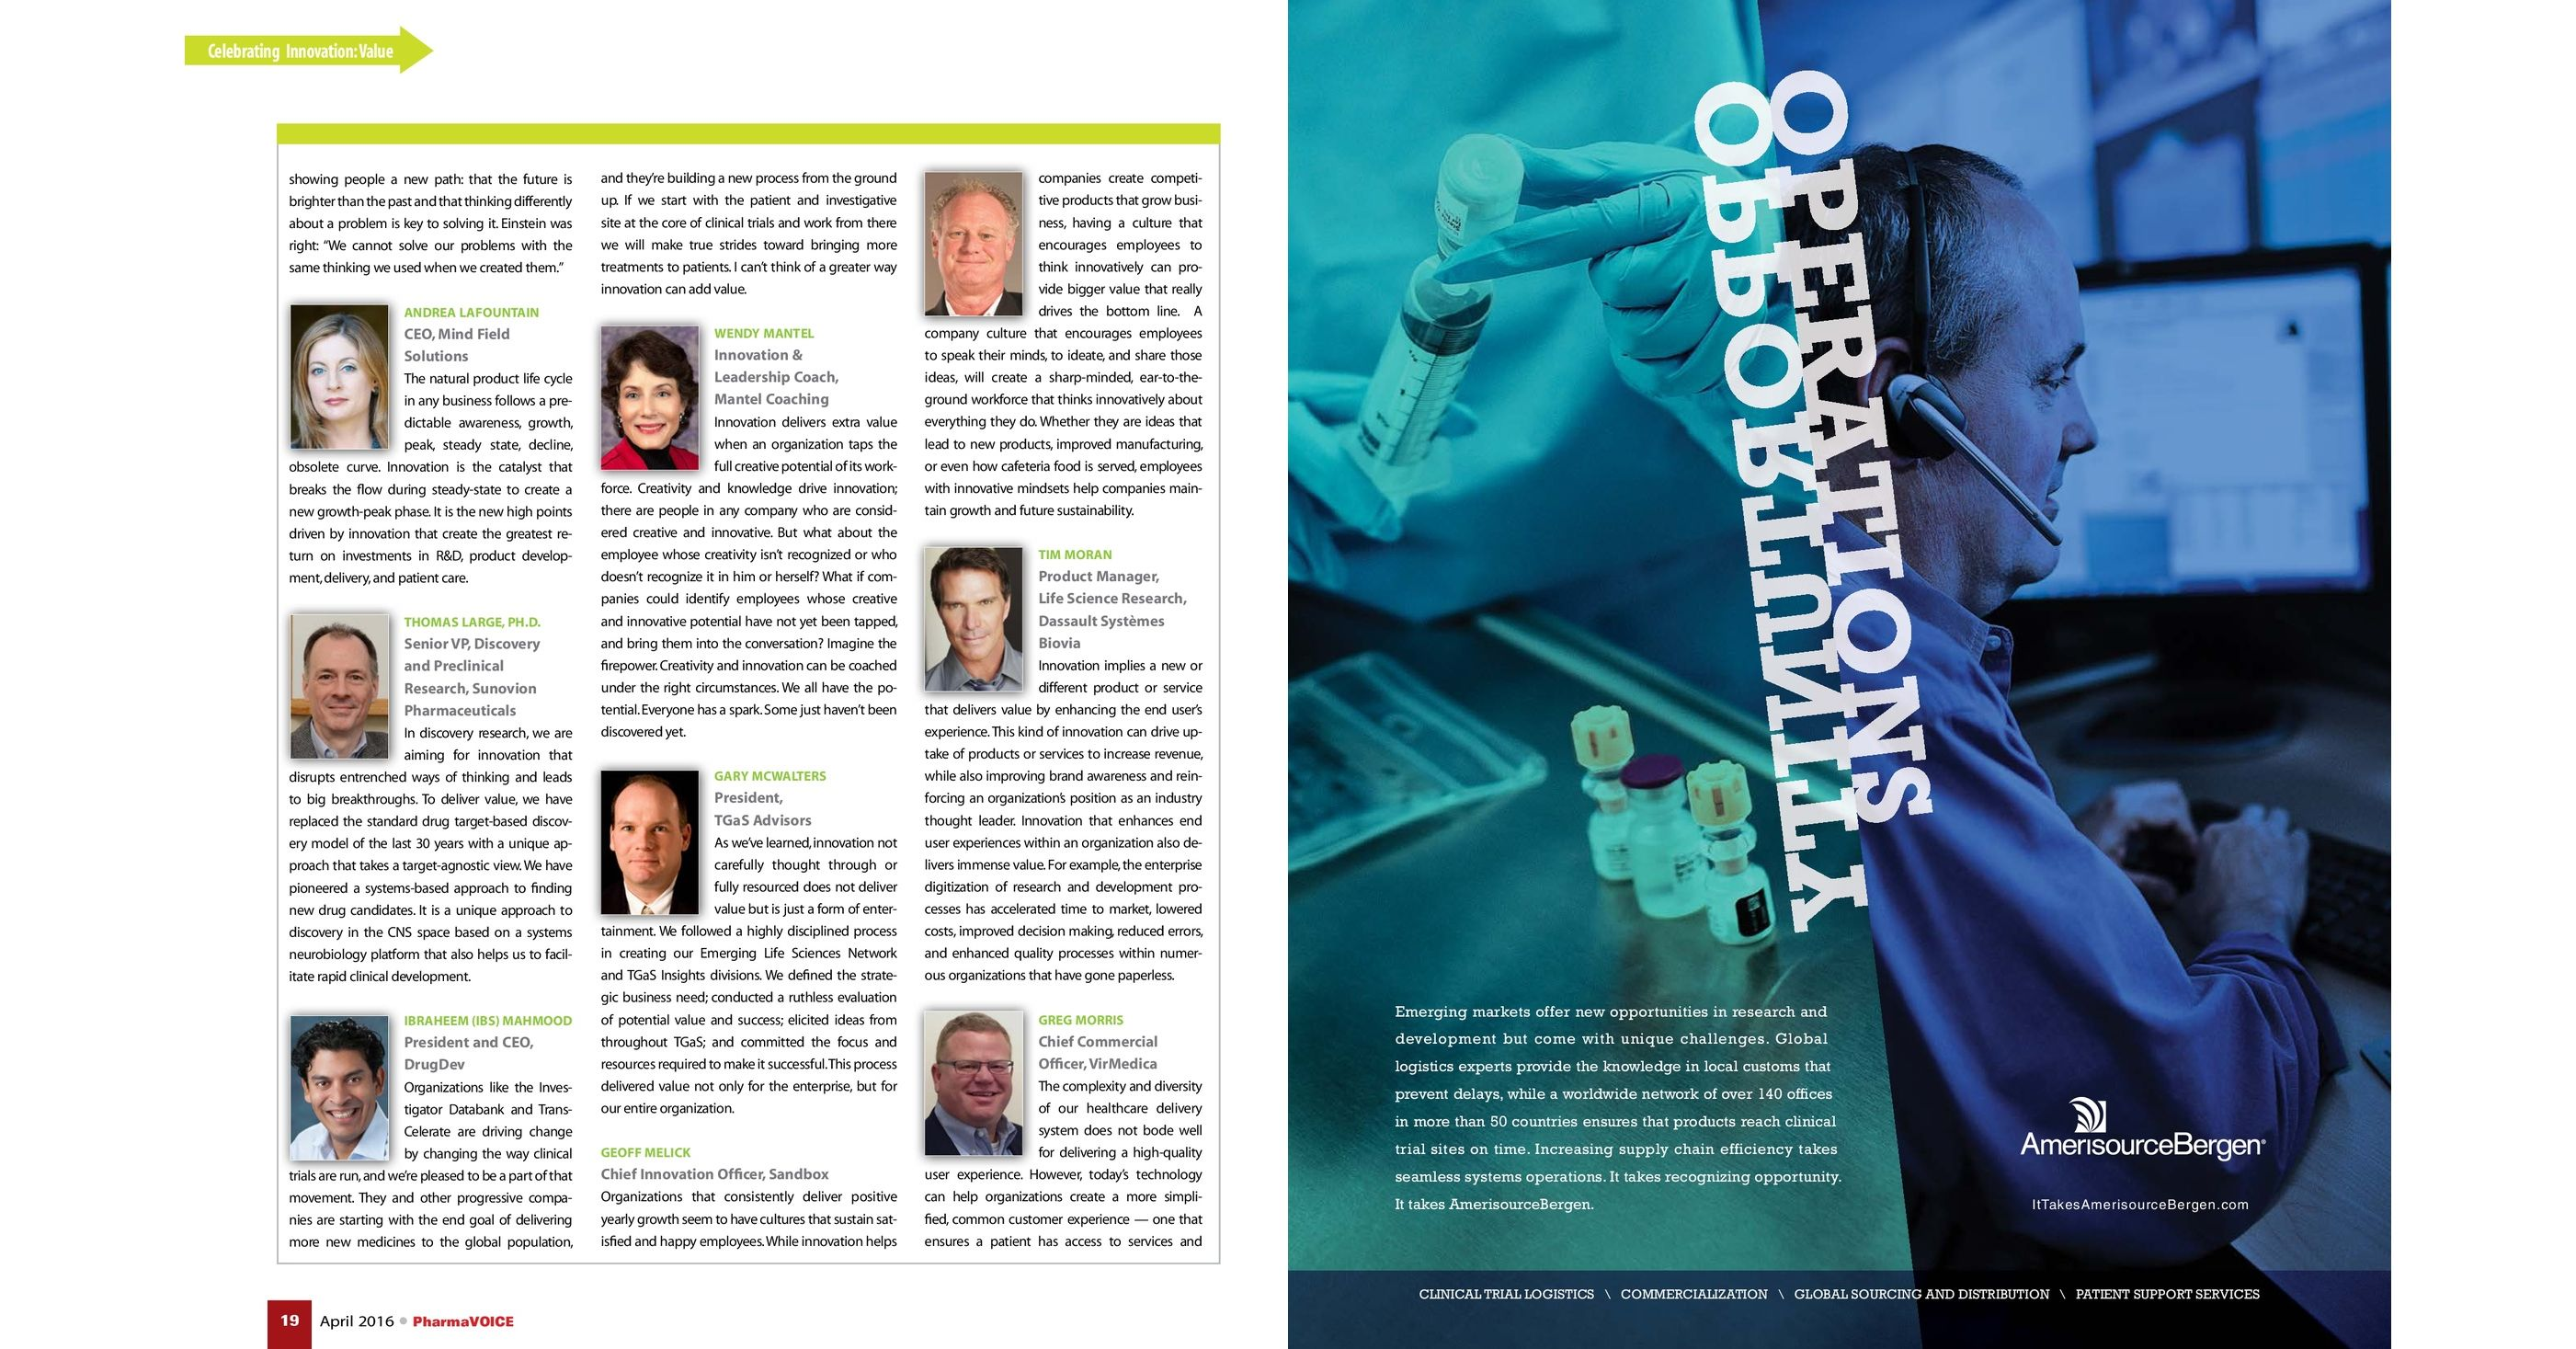 PharmaVOICE | April 2016